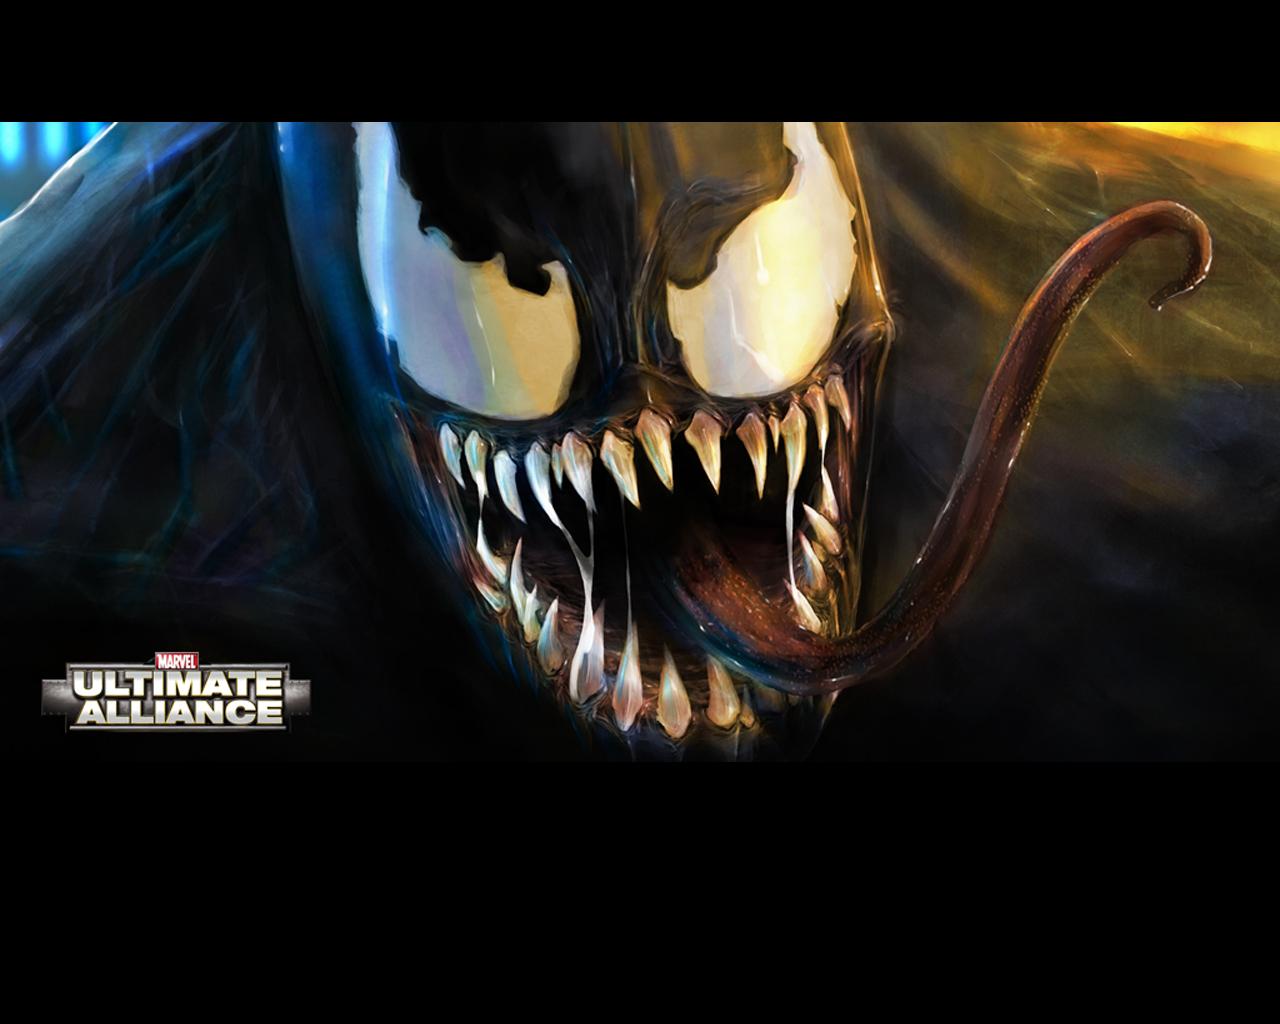 venom marvel ultimate alliance wallpaper venom wallpaper venomjpg 1280x1024